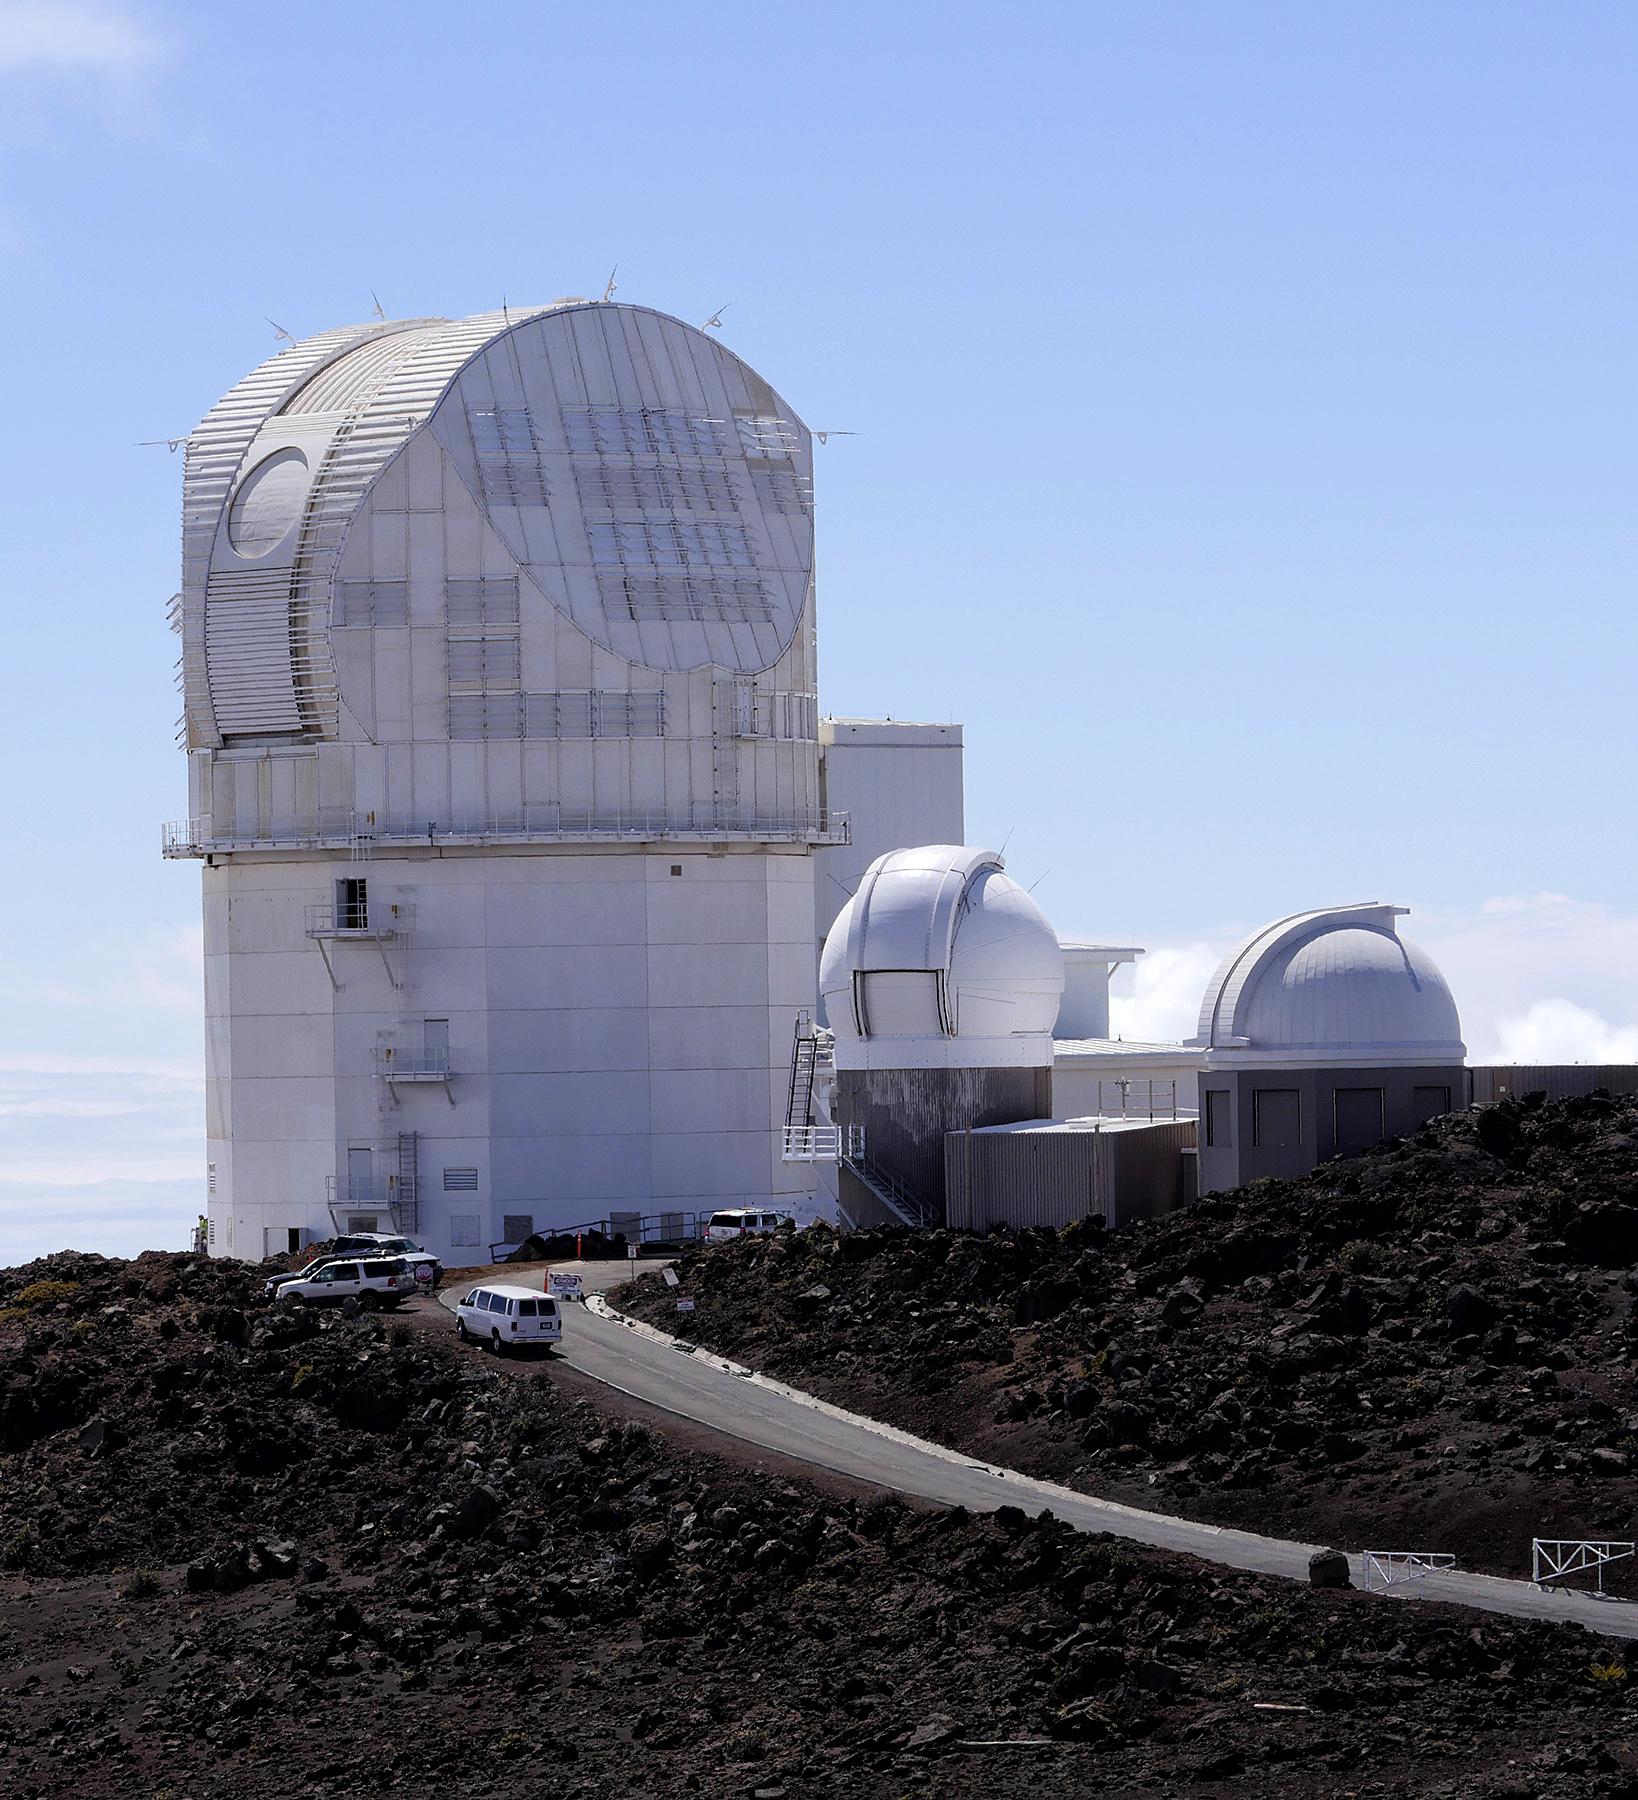 Haleakala Observatories by bensonga in bensonga